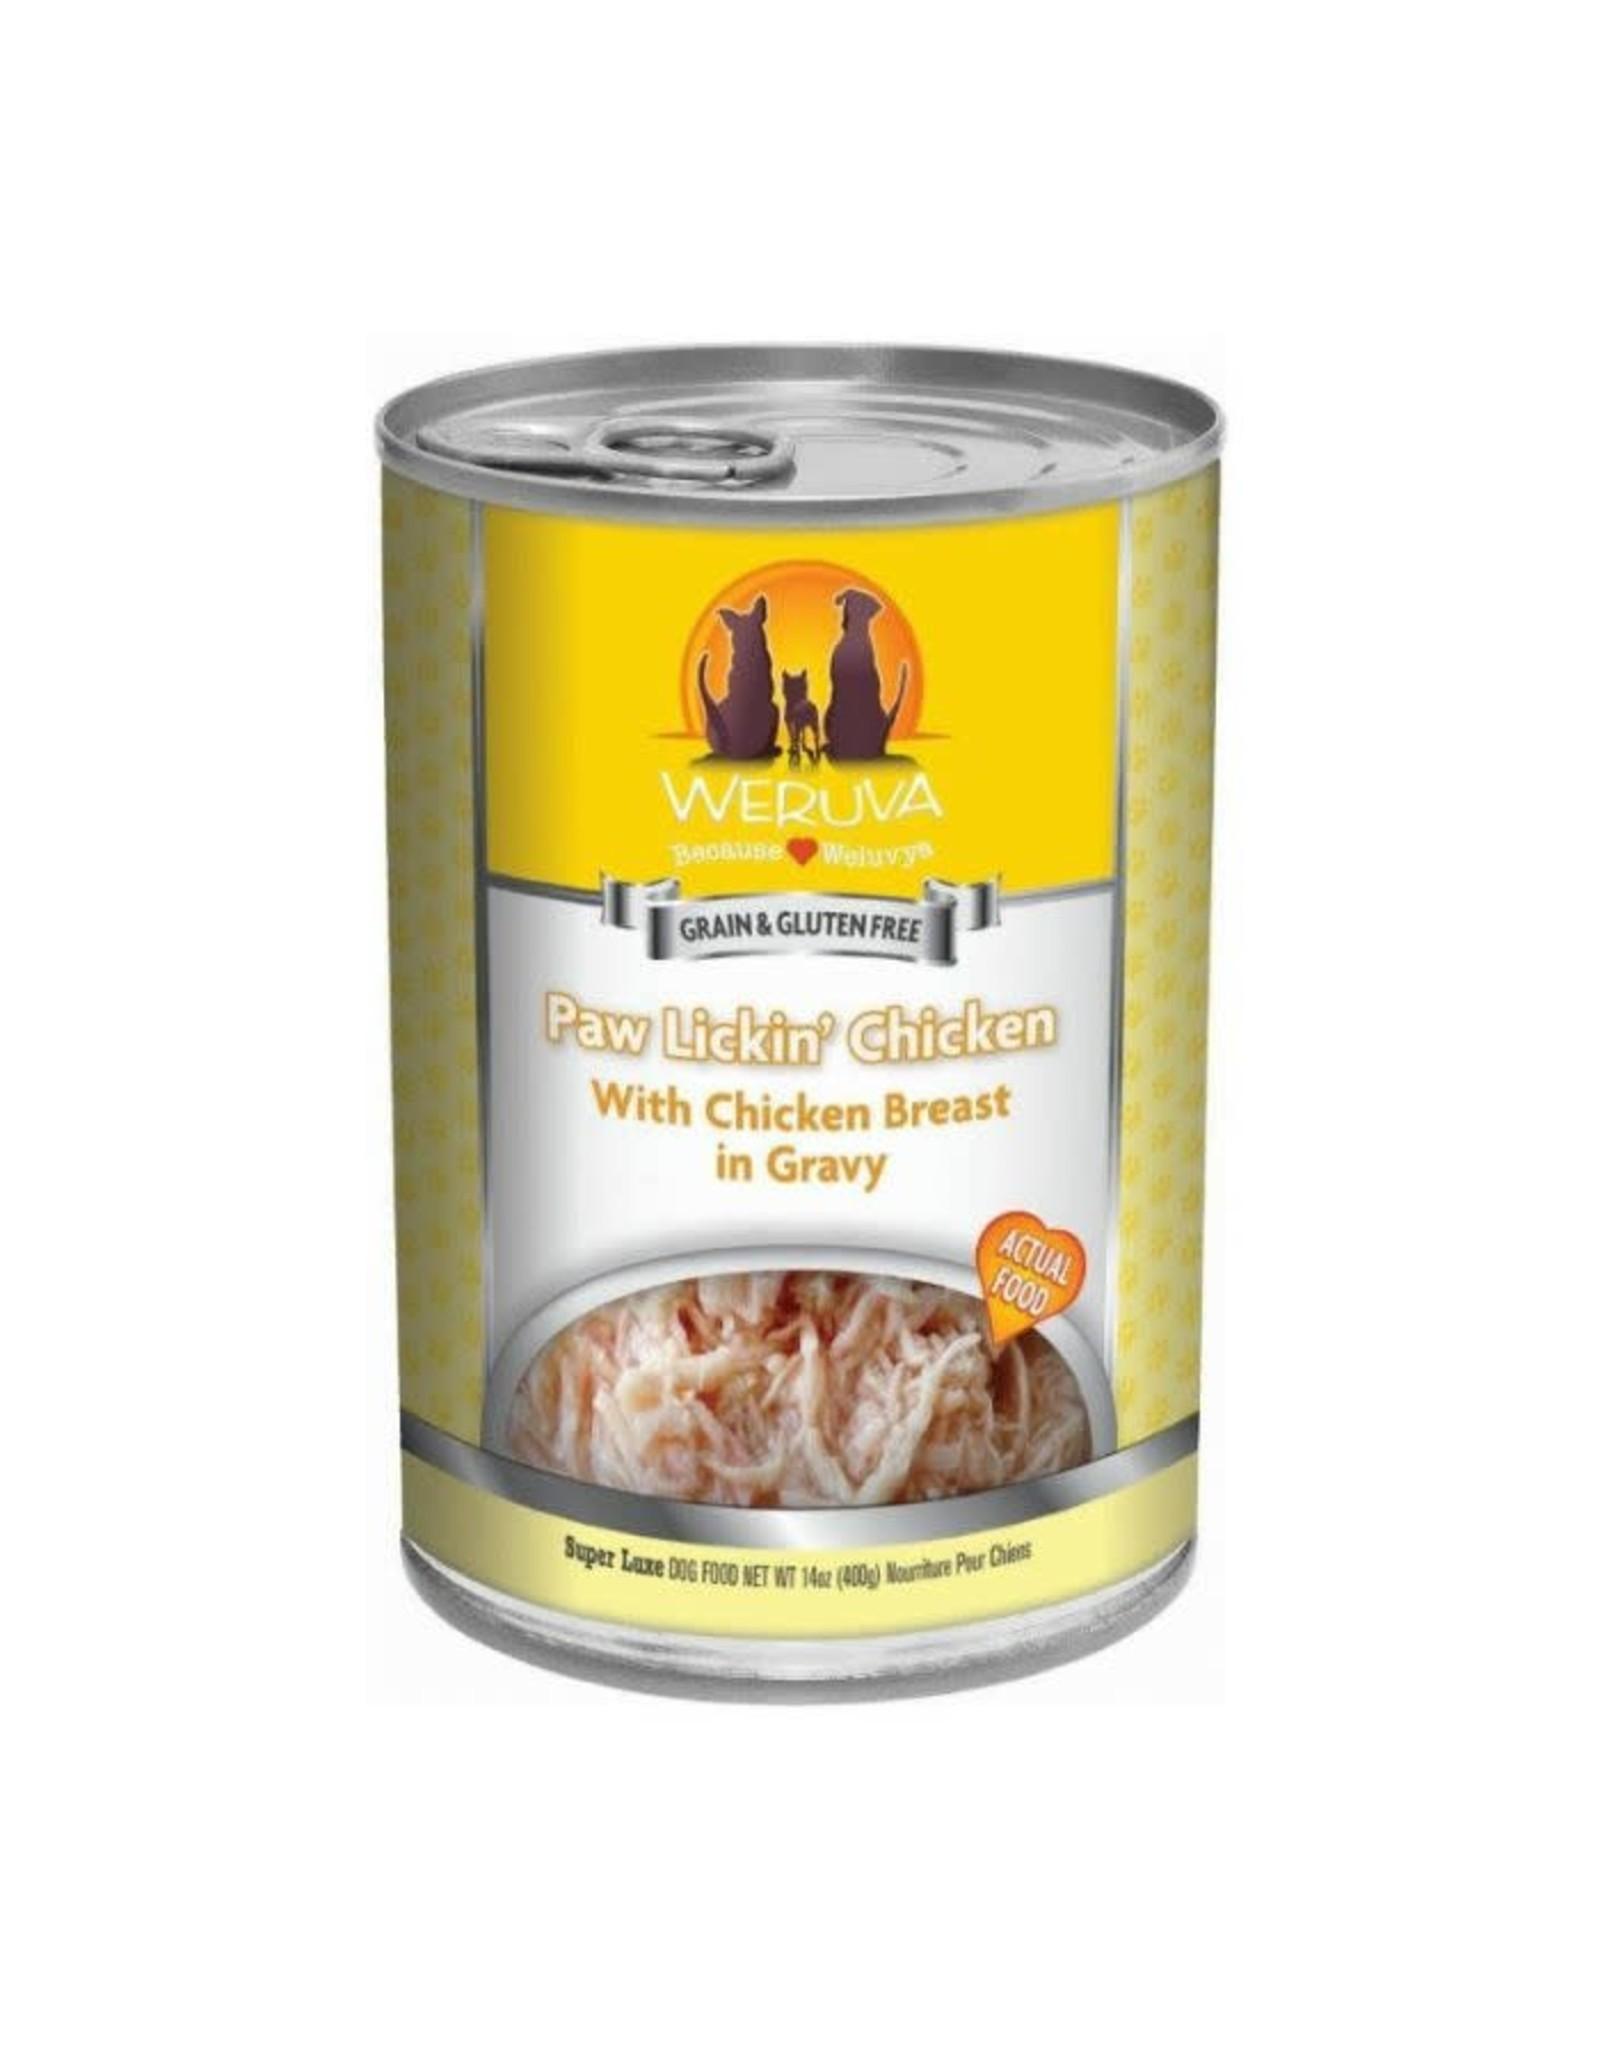 Weruva Weruva Paw Lickin Dog Food 14oz